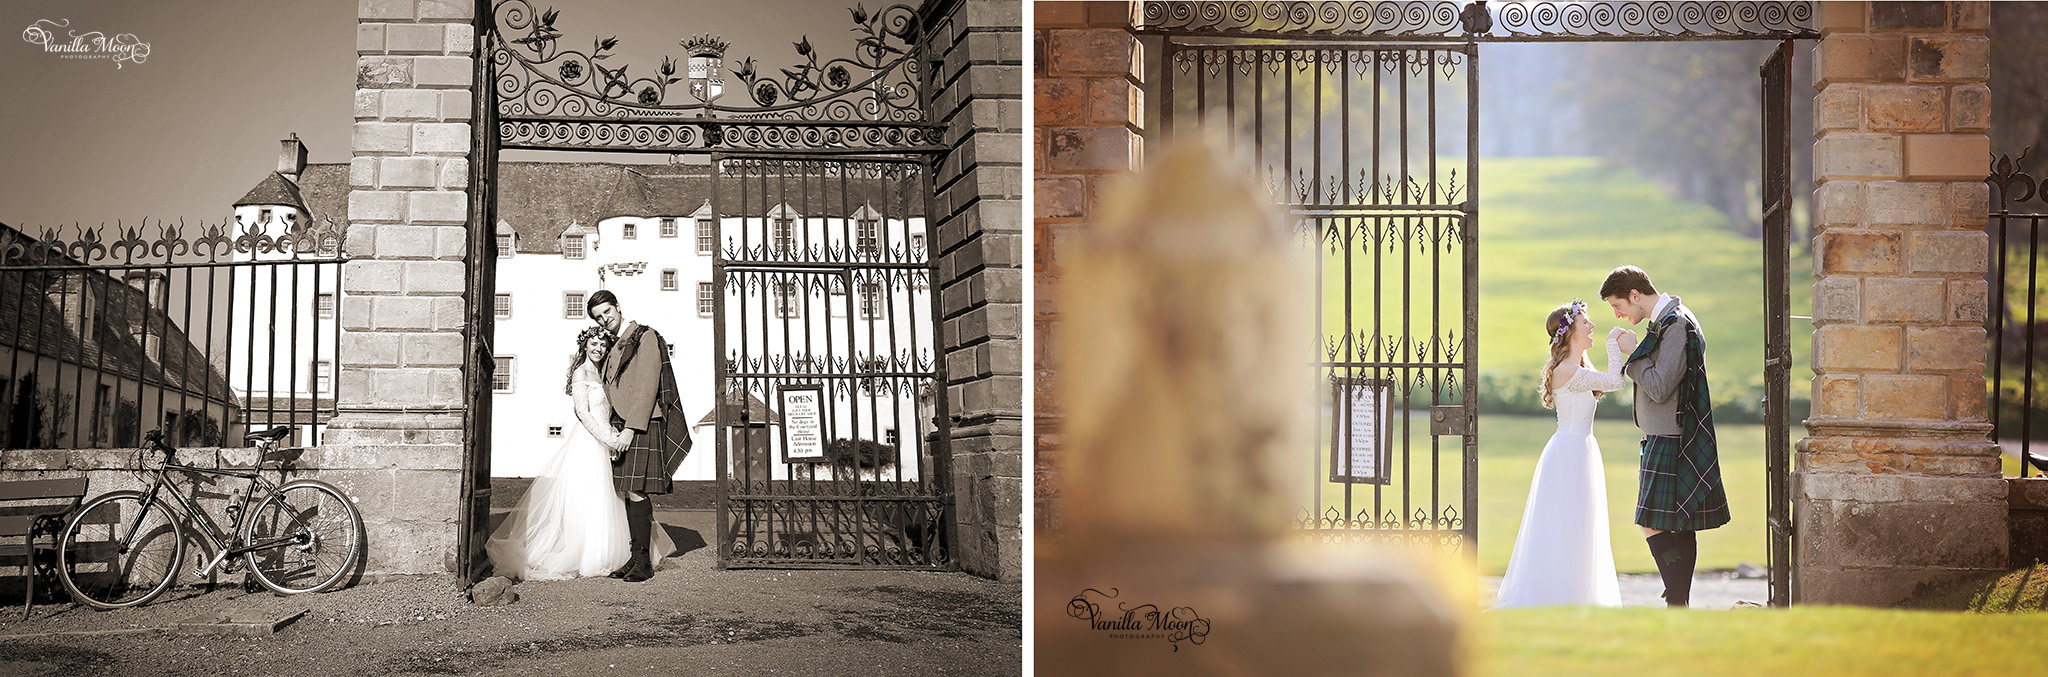 marjorie gates.jpg